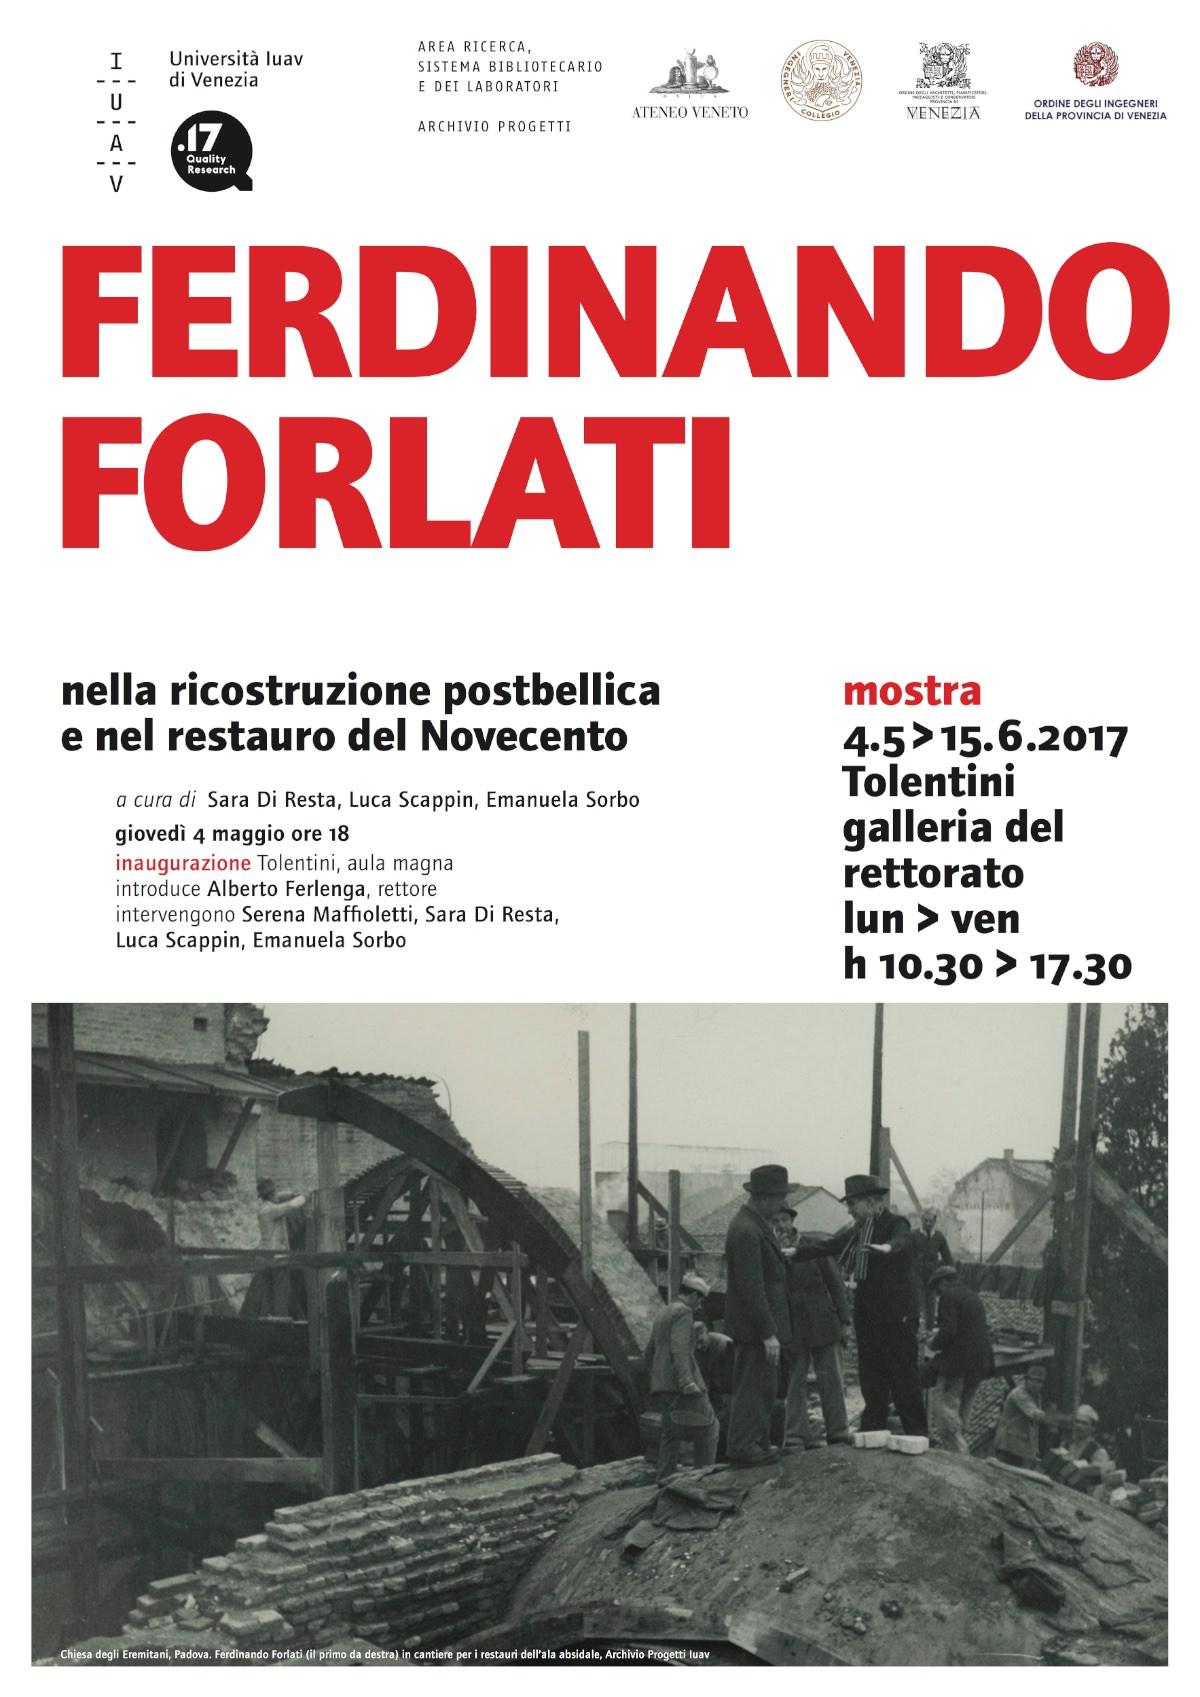 Ferdinando Forlati